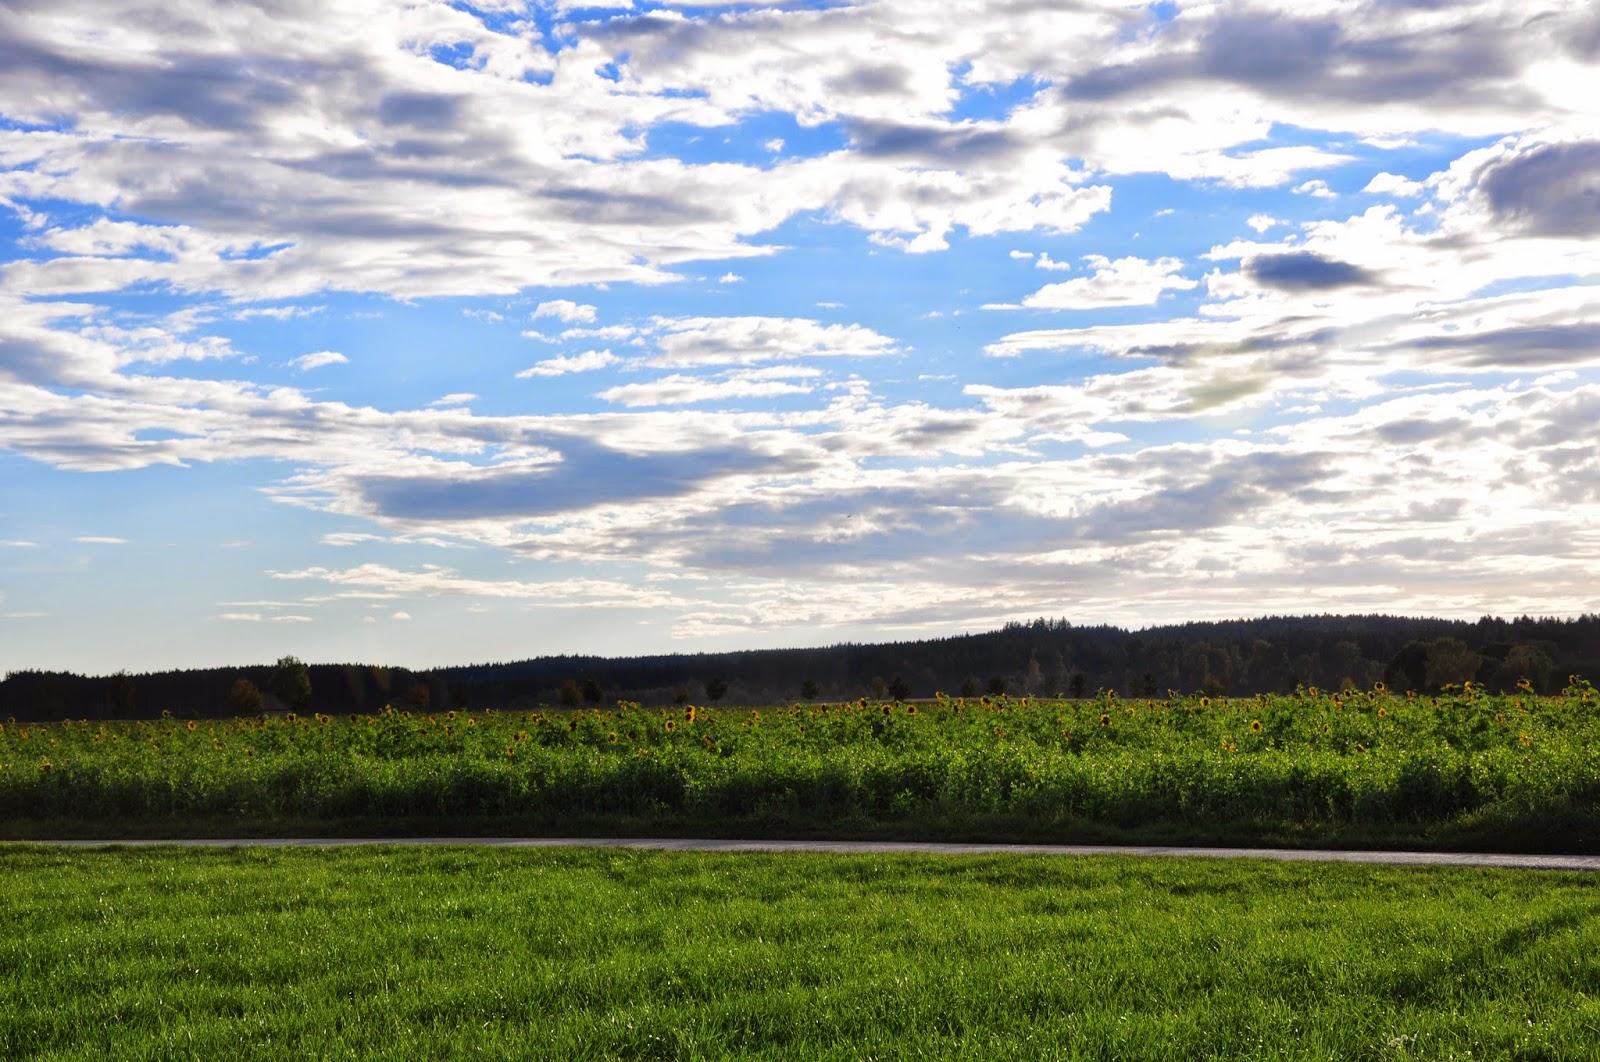 Herbst-Impressionen | Sonnenblumenfeld